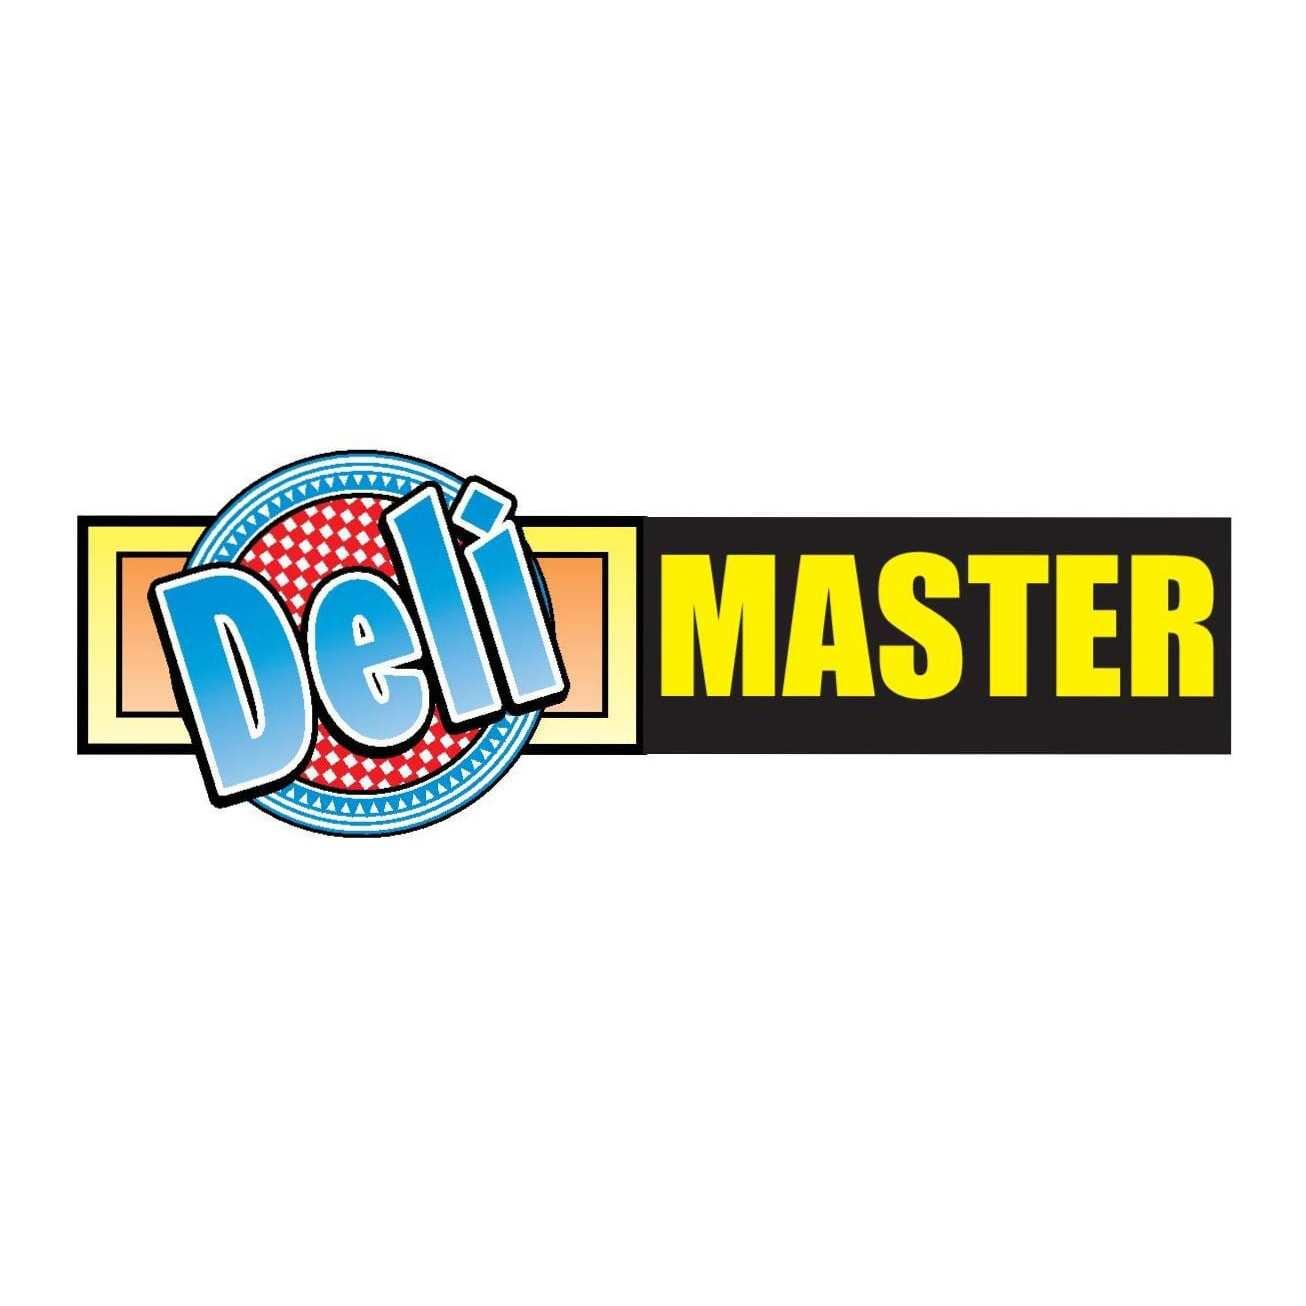 Deli Master Foods